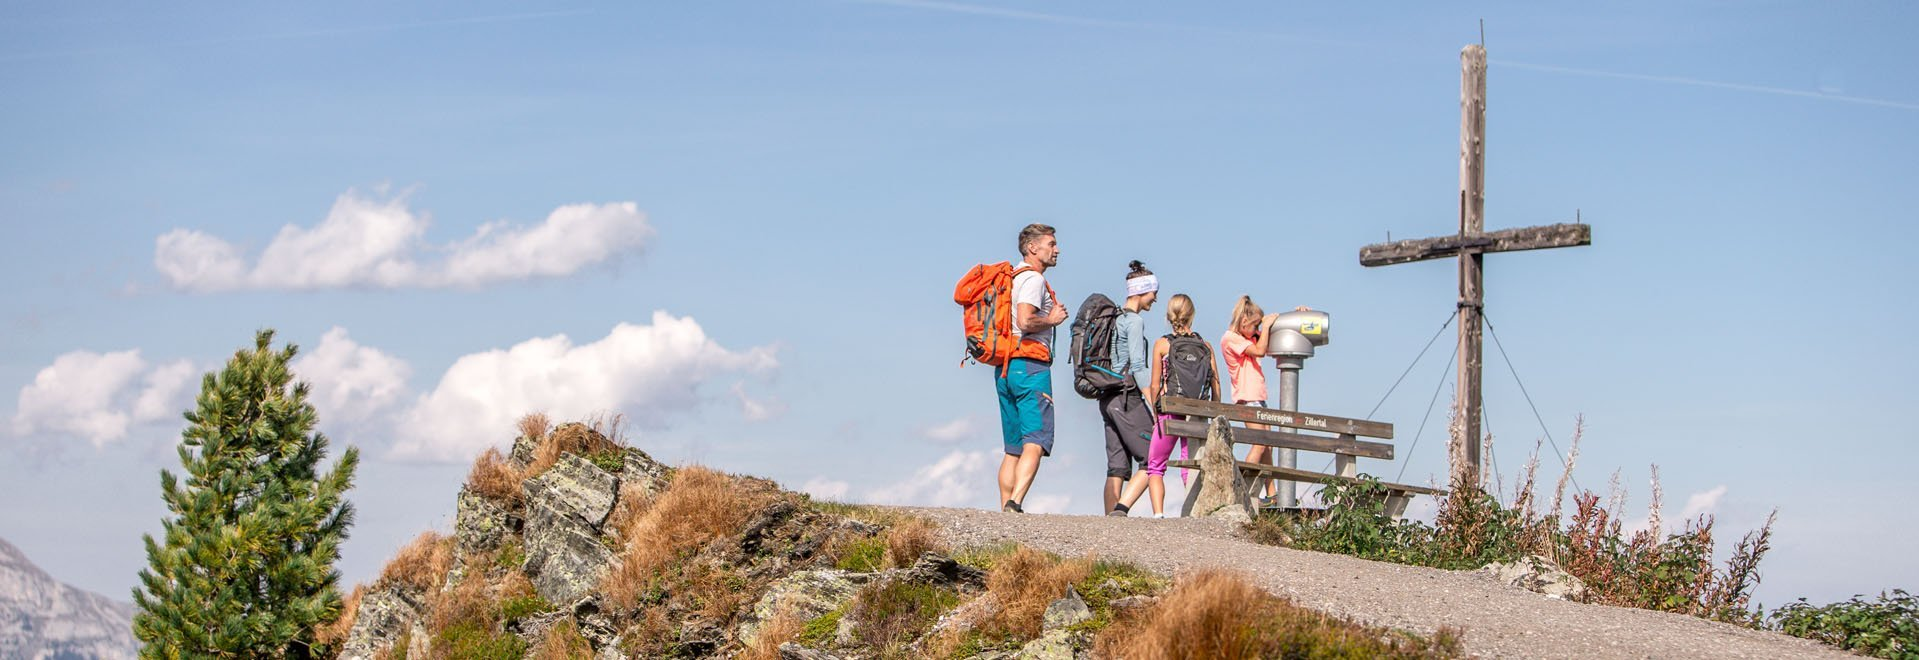 Wandern zum Gipfel am Spieljoch